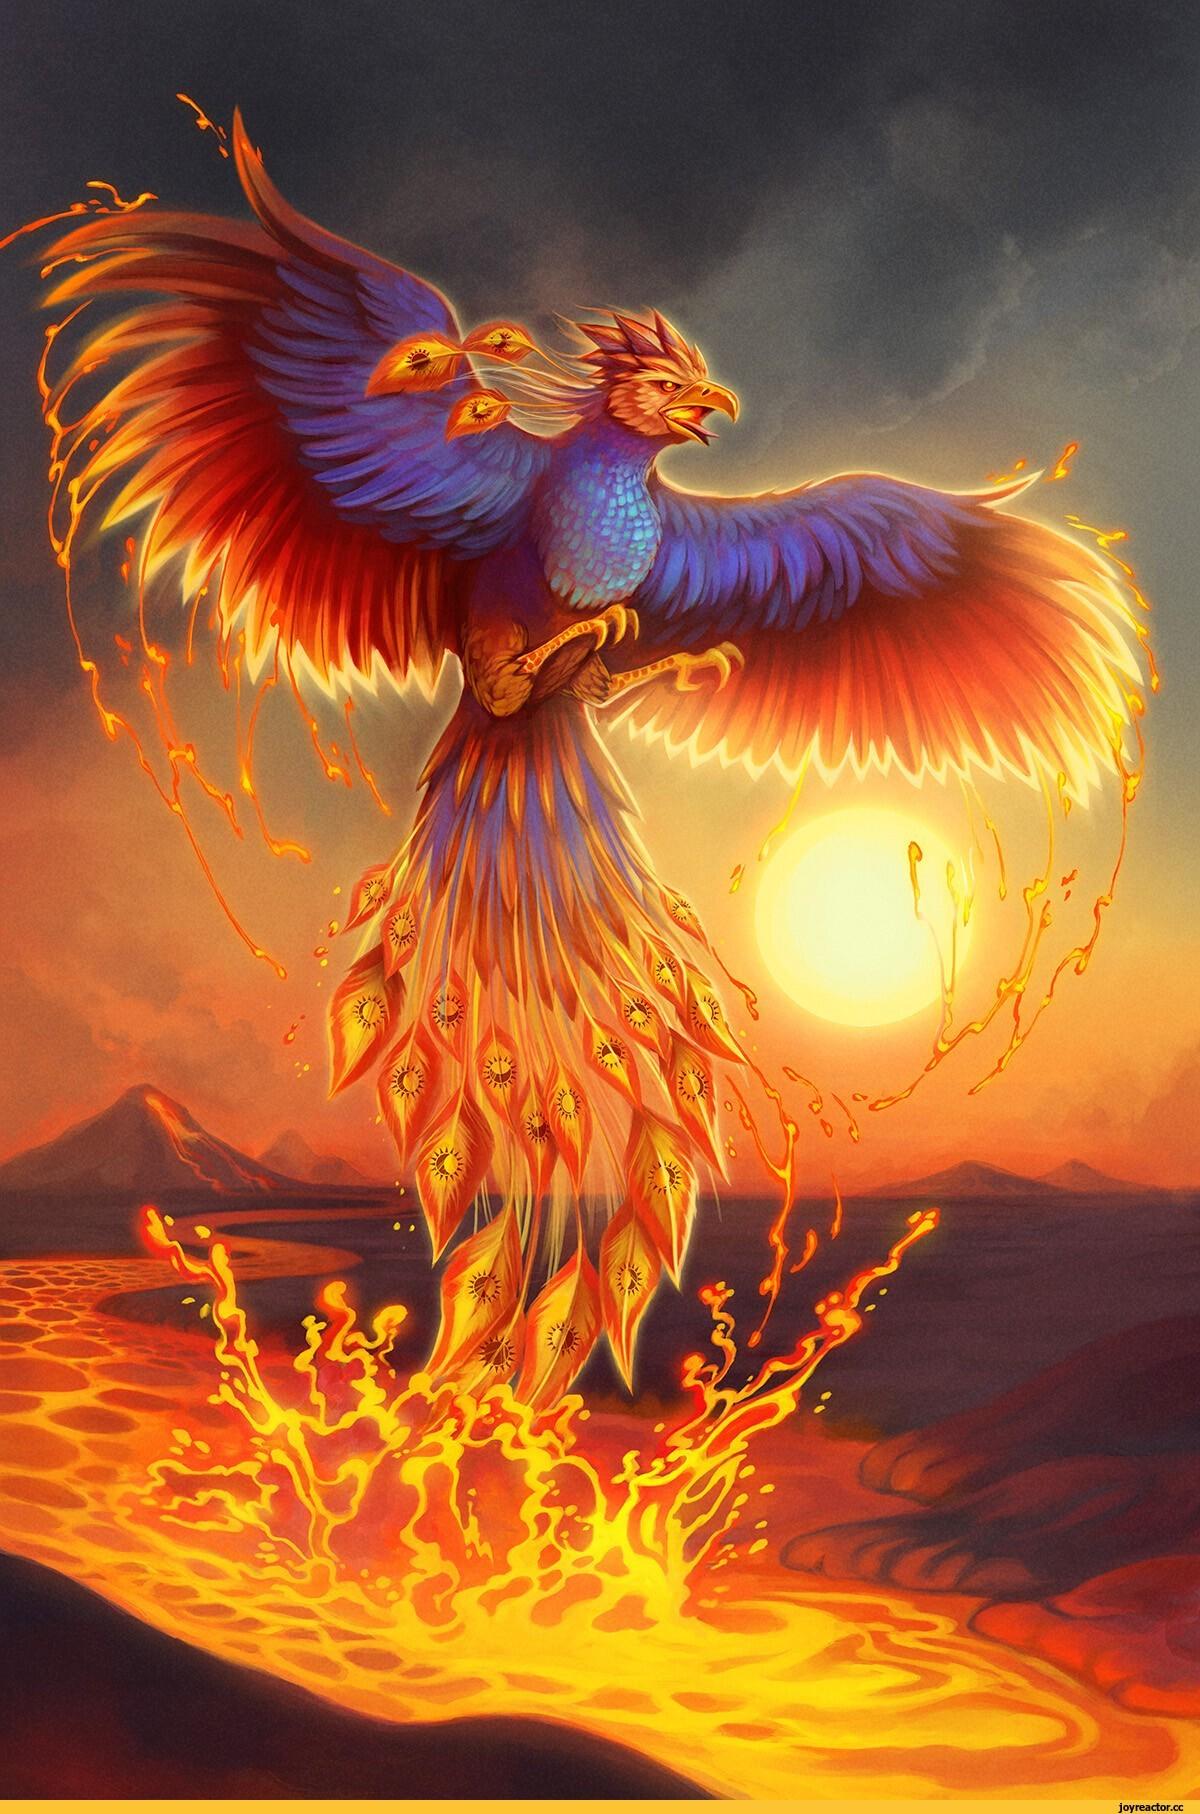 Феникс (значения) — википедия. что такое феникс (значения)